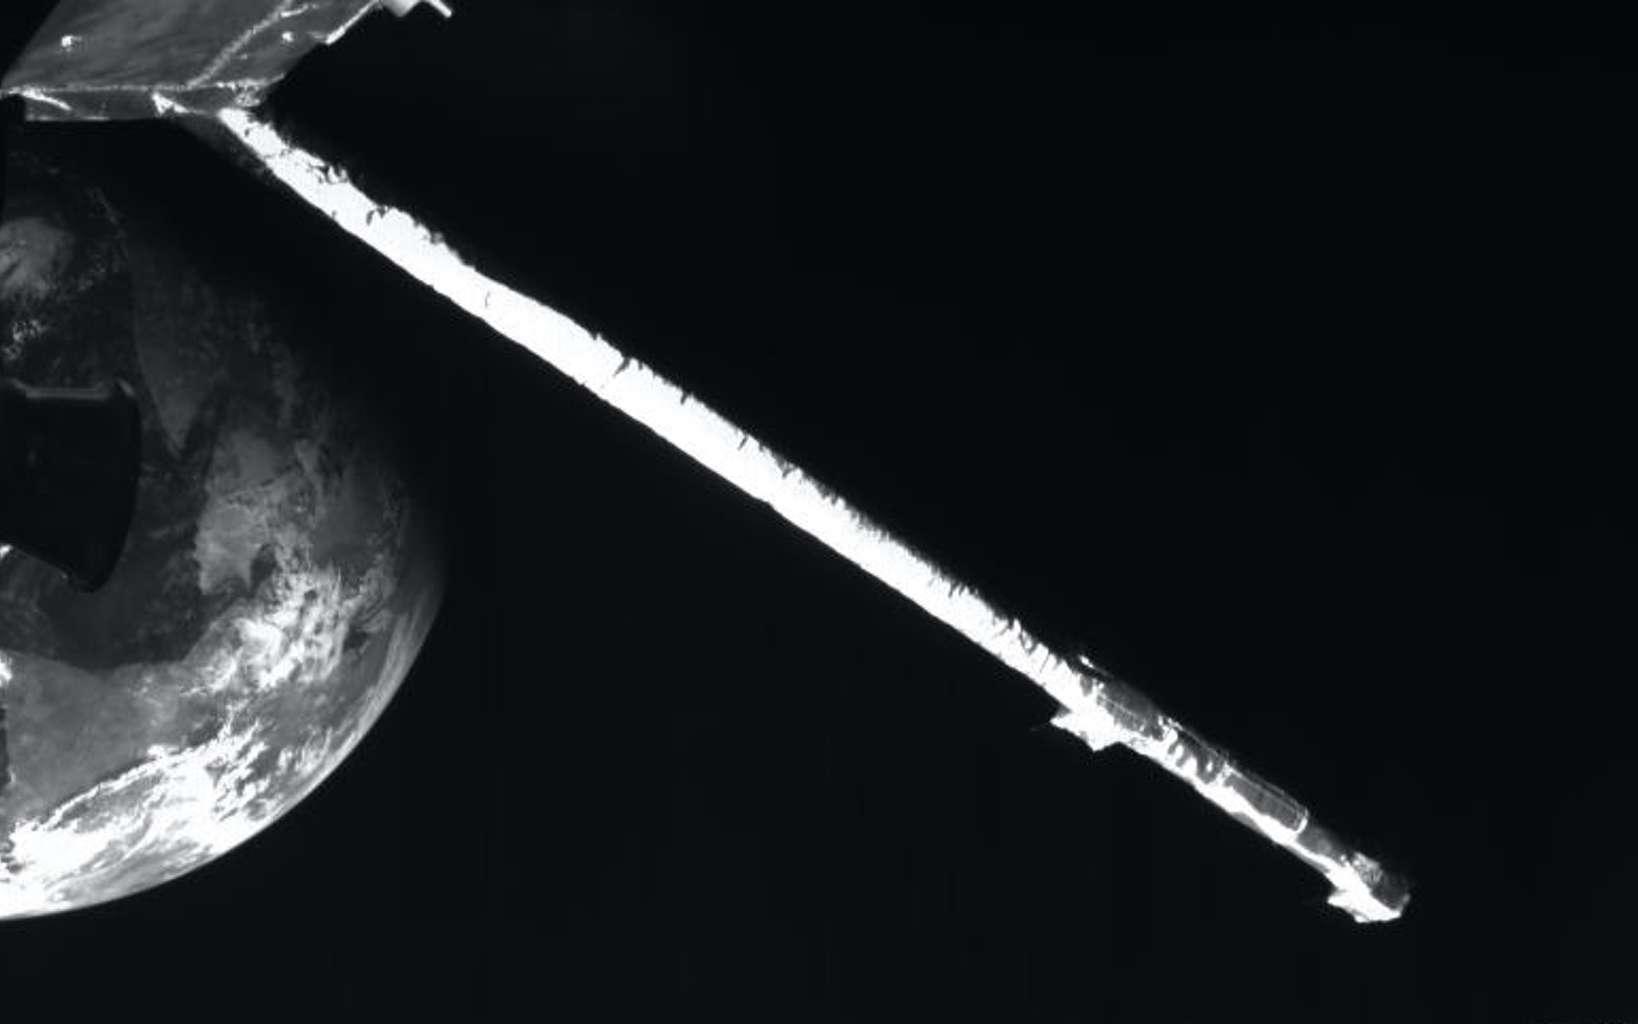 Photo prise par Bepi Colombo lors de son survol de la Terre, le 10 avril 2020. © ESA, BepiColombo, MTM, CC by-sa 3.0 IGO